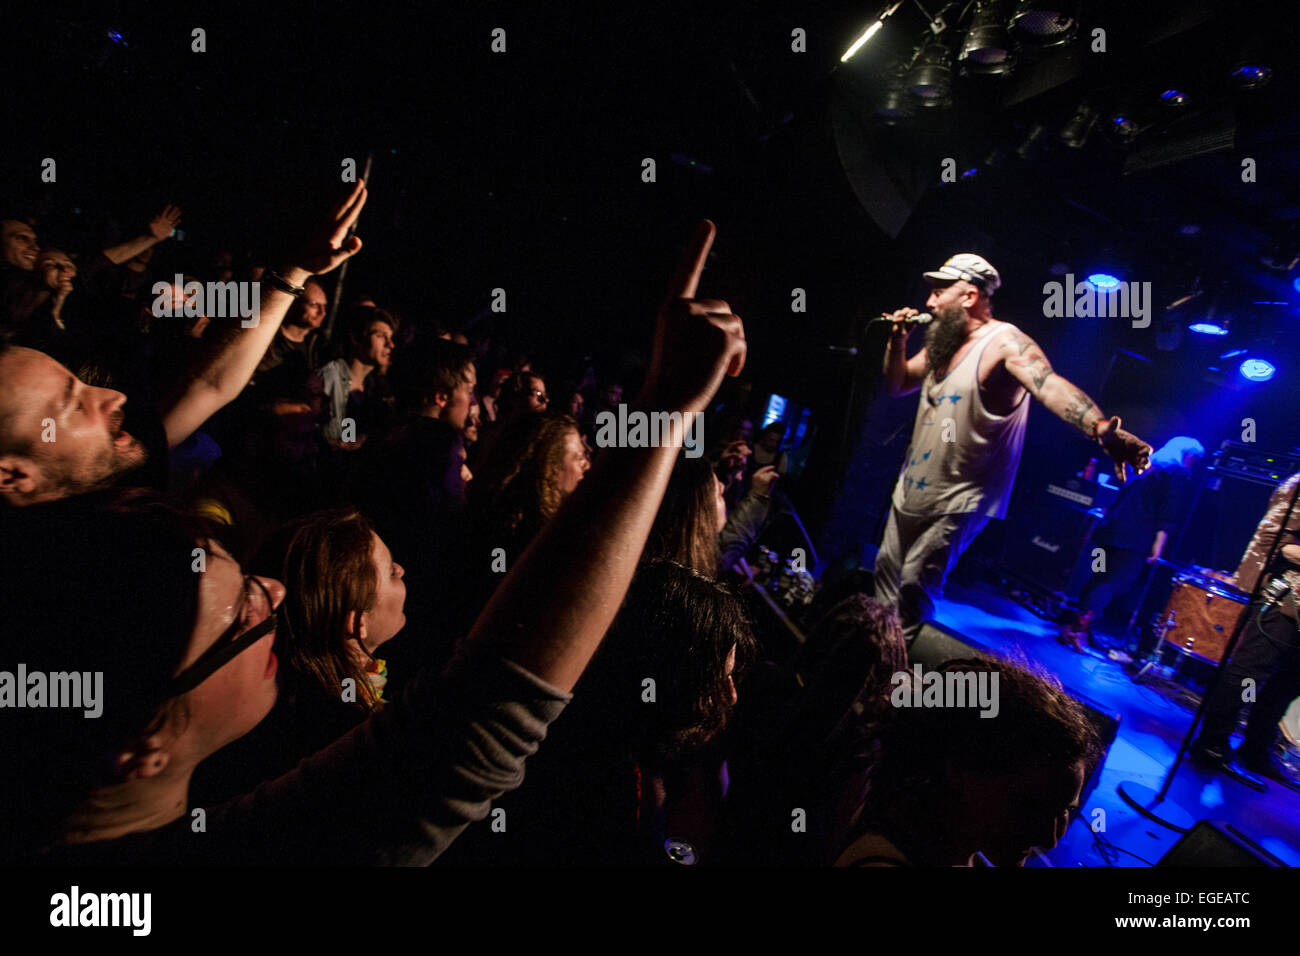 Ljubljana, Slovenia. 23rd February, 2015. Concert of Seatlle basled gypsy-punk band Kultur Shock , which mix Rock, - Stock Image